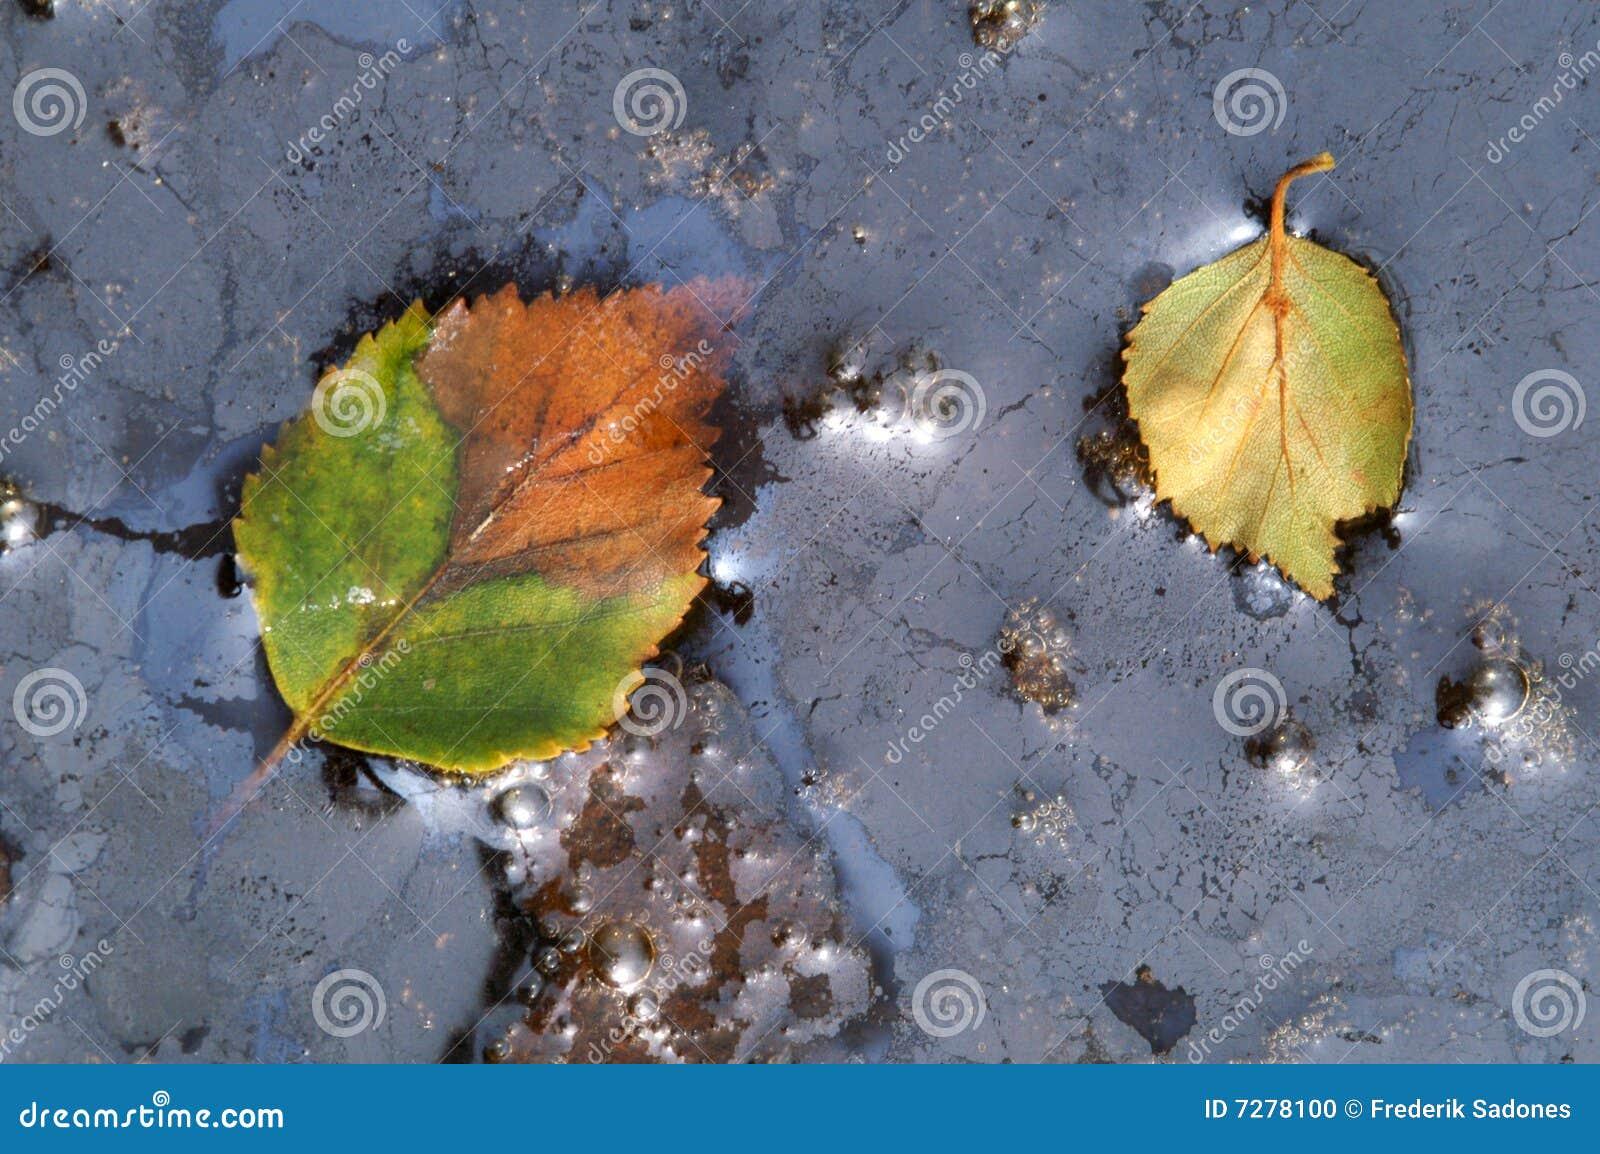 As folhas caíram